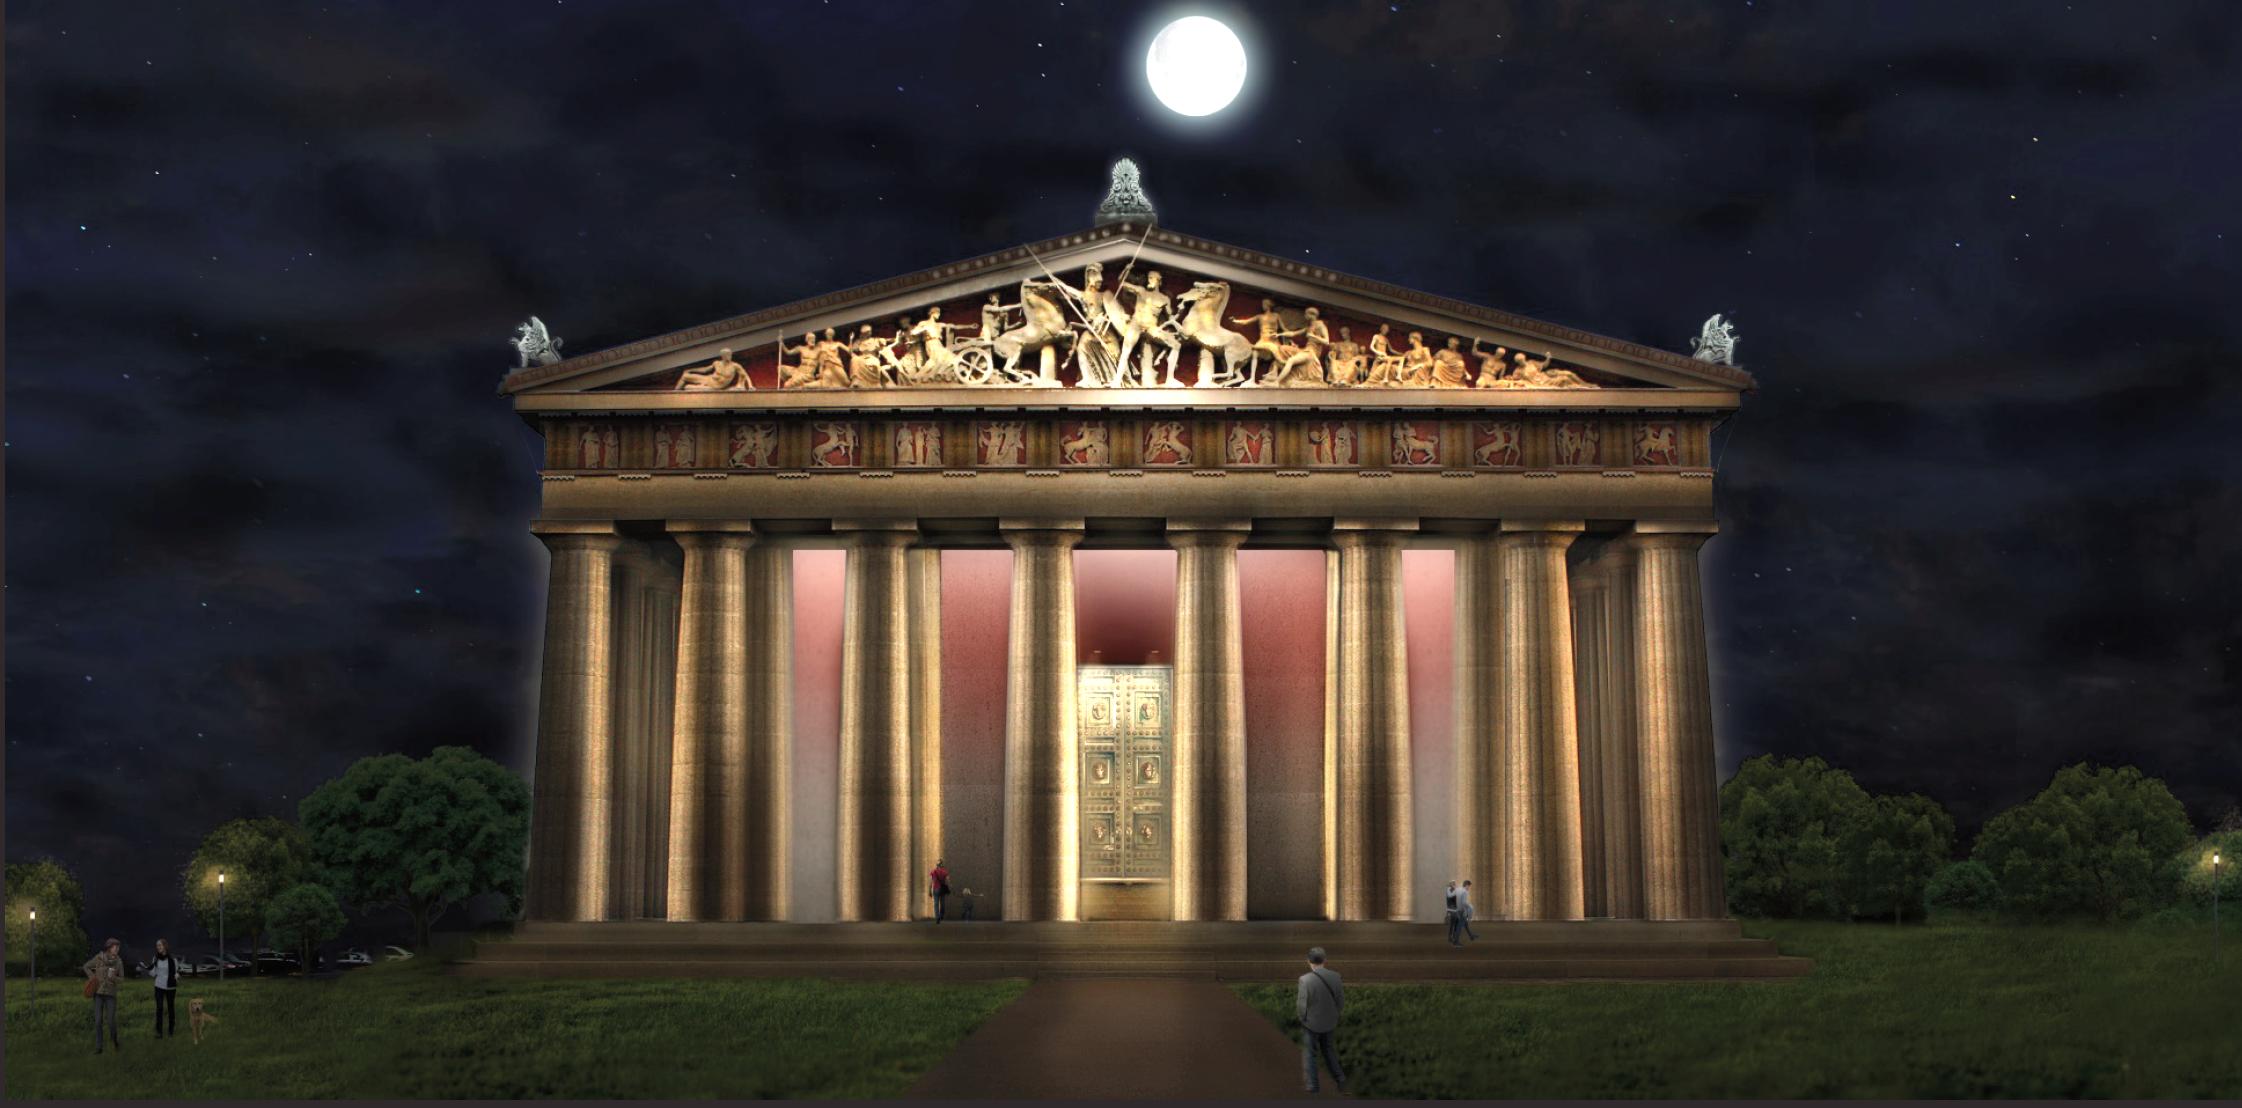 Nashvilles Centennial Park To Get 22M Upgrade With New Lighting